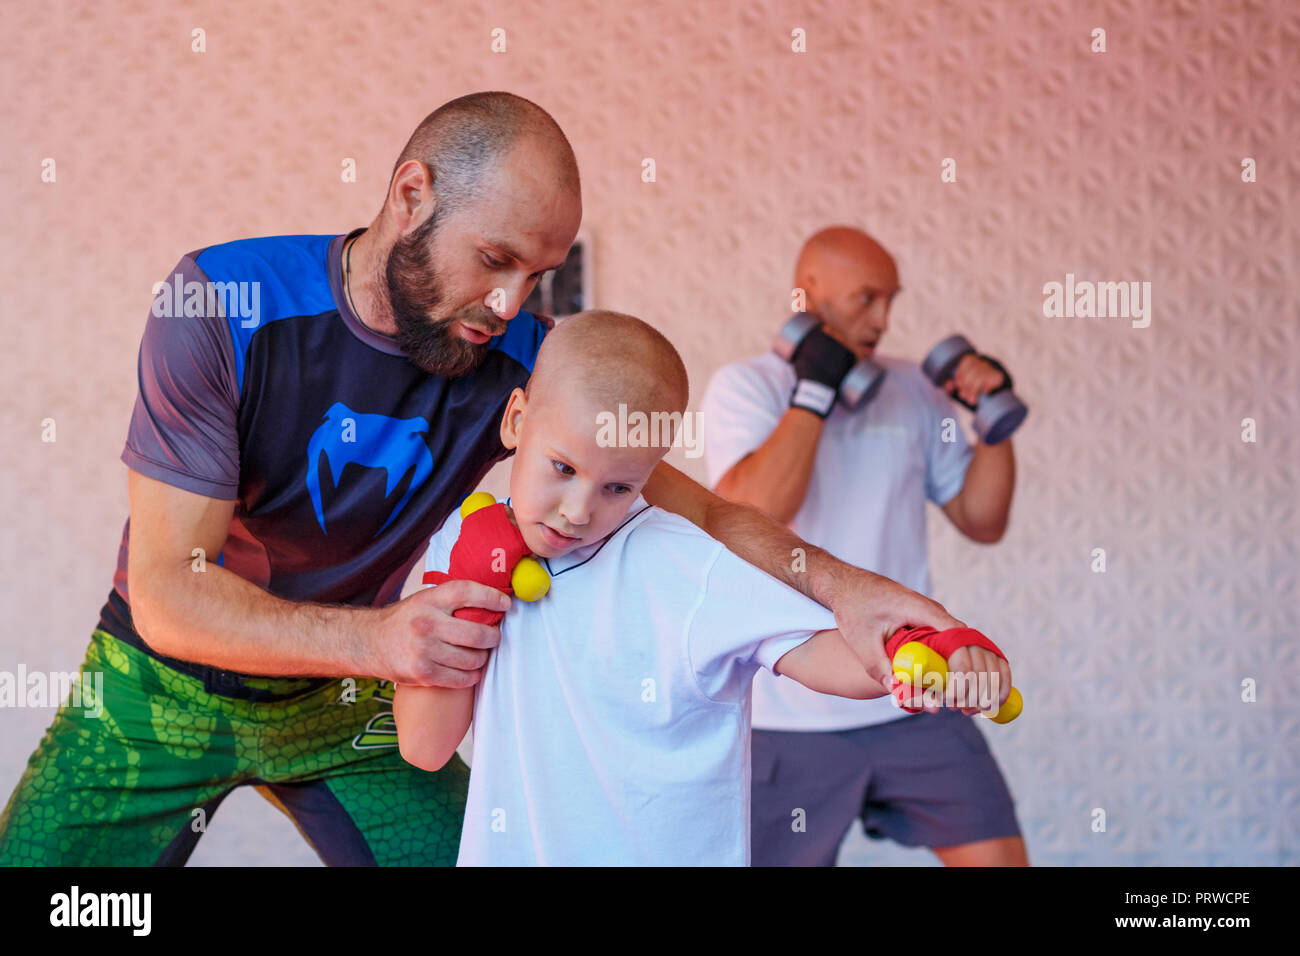 the coach teaches the boy kick Boxing. - Stock Image